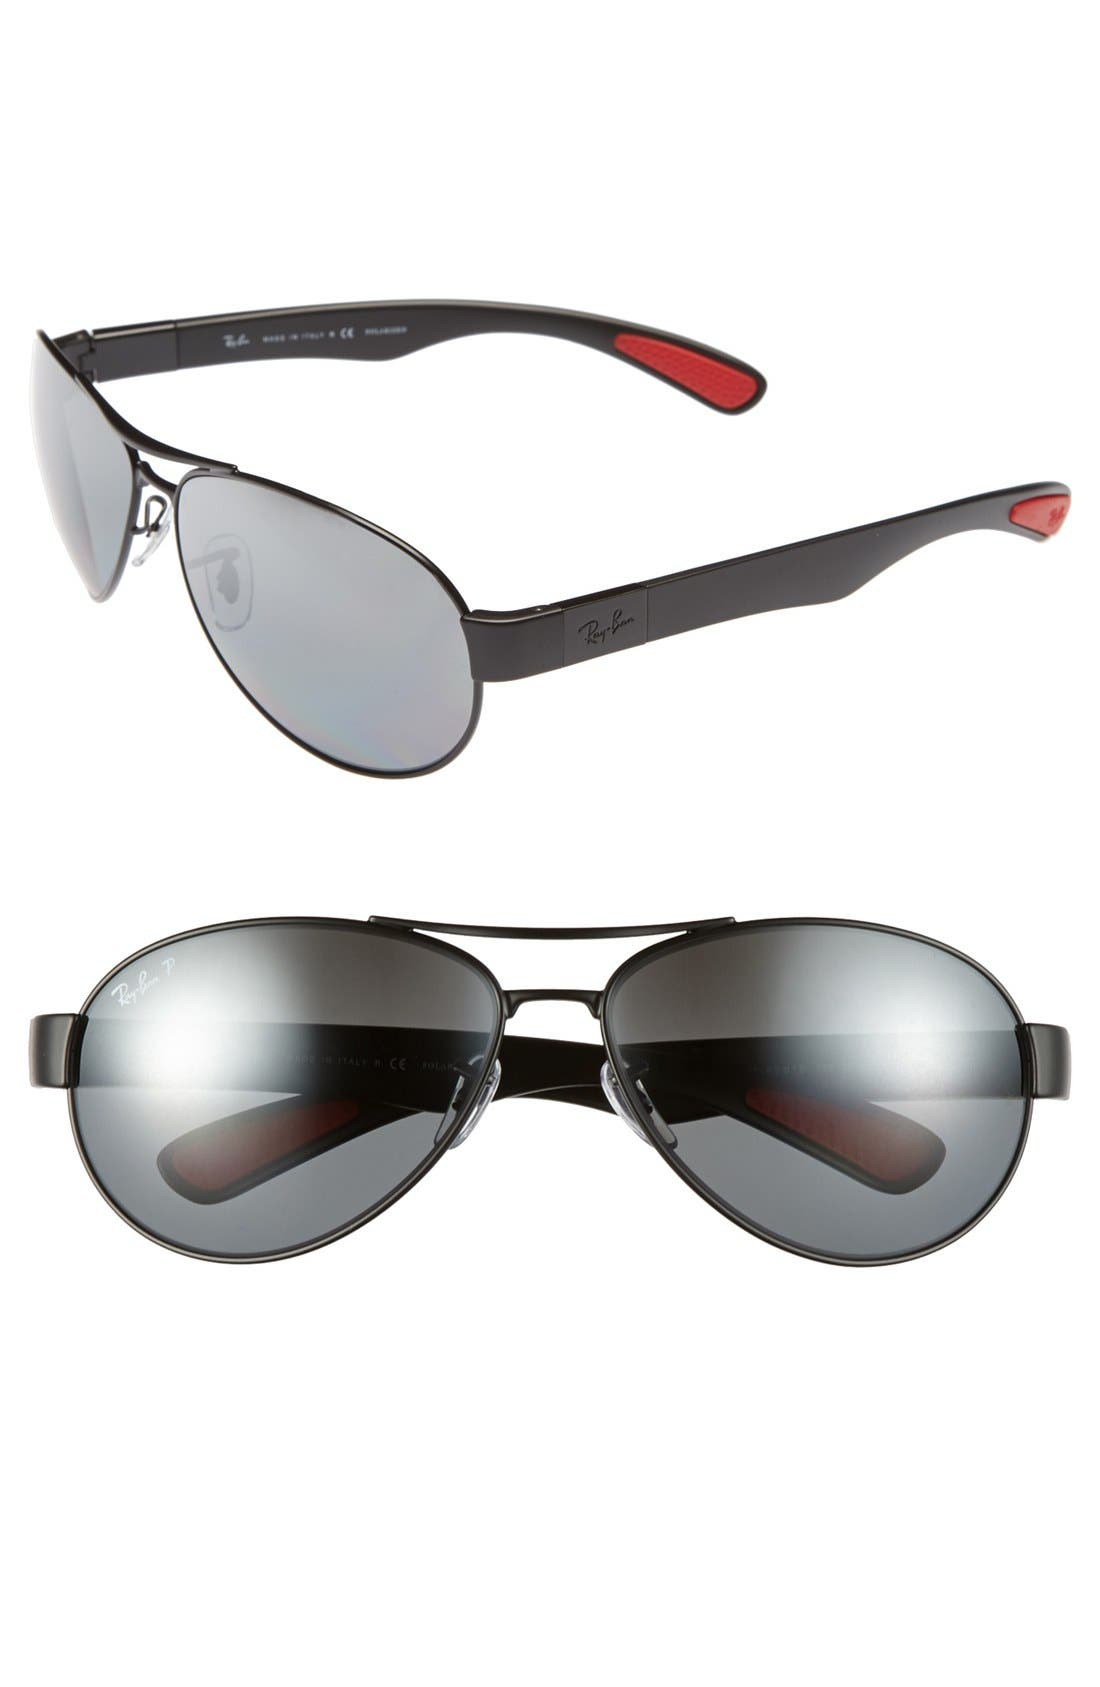 Alternate Image 1 Selected - Ray-Ban 'Pilot' Polarized Sunglasses